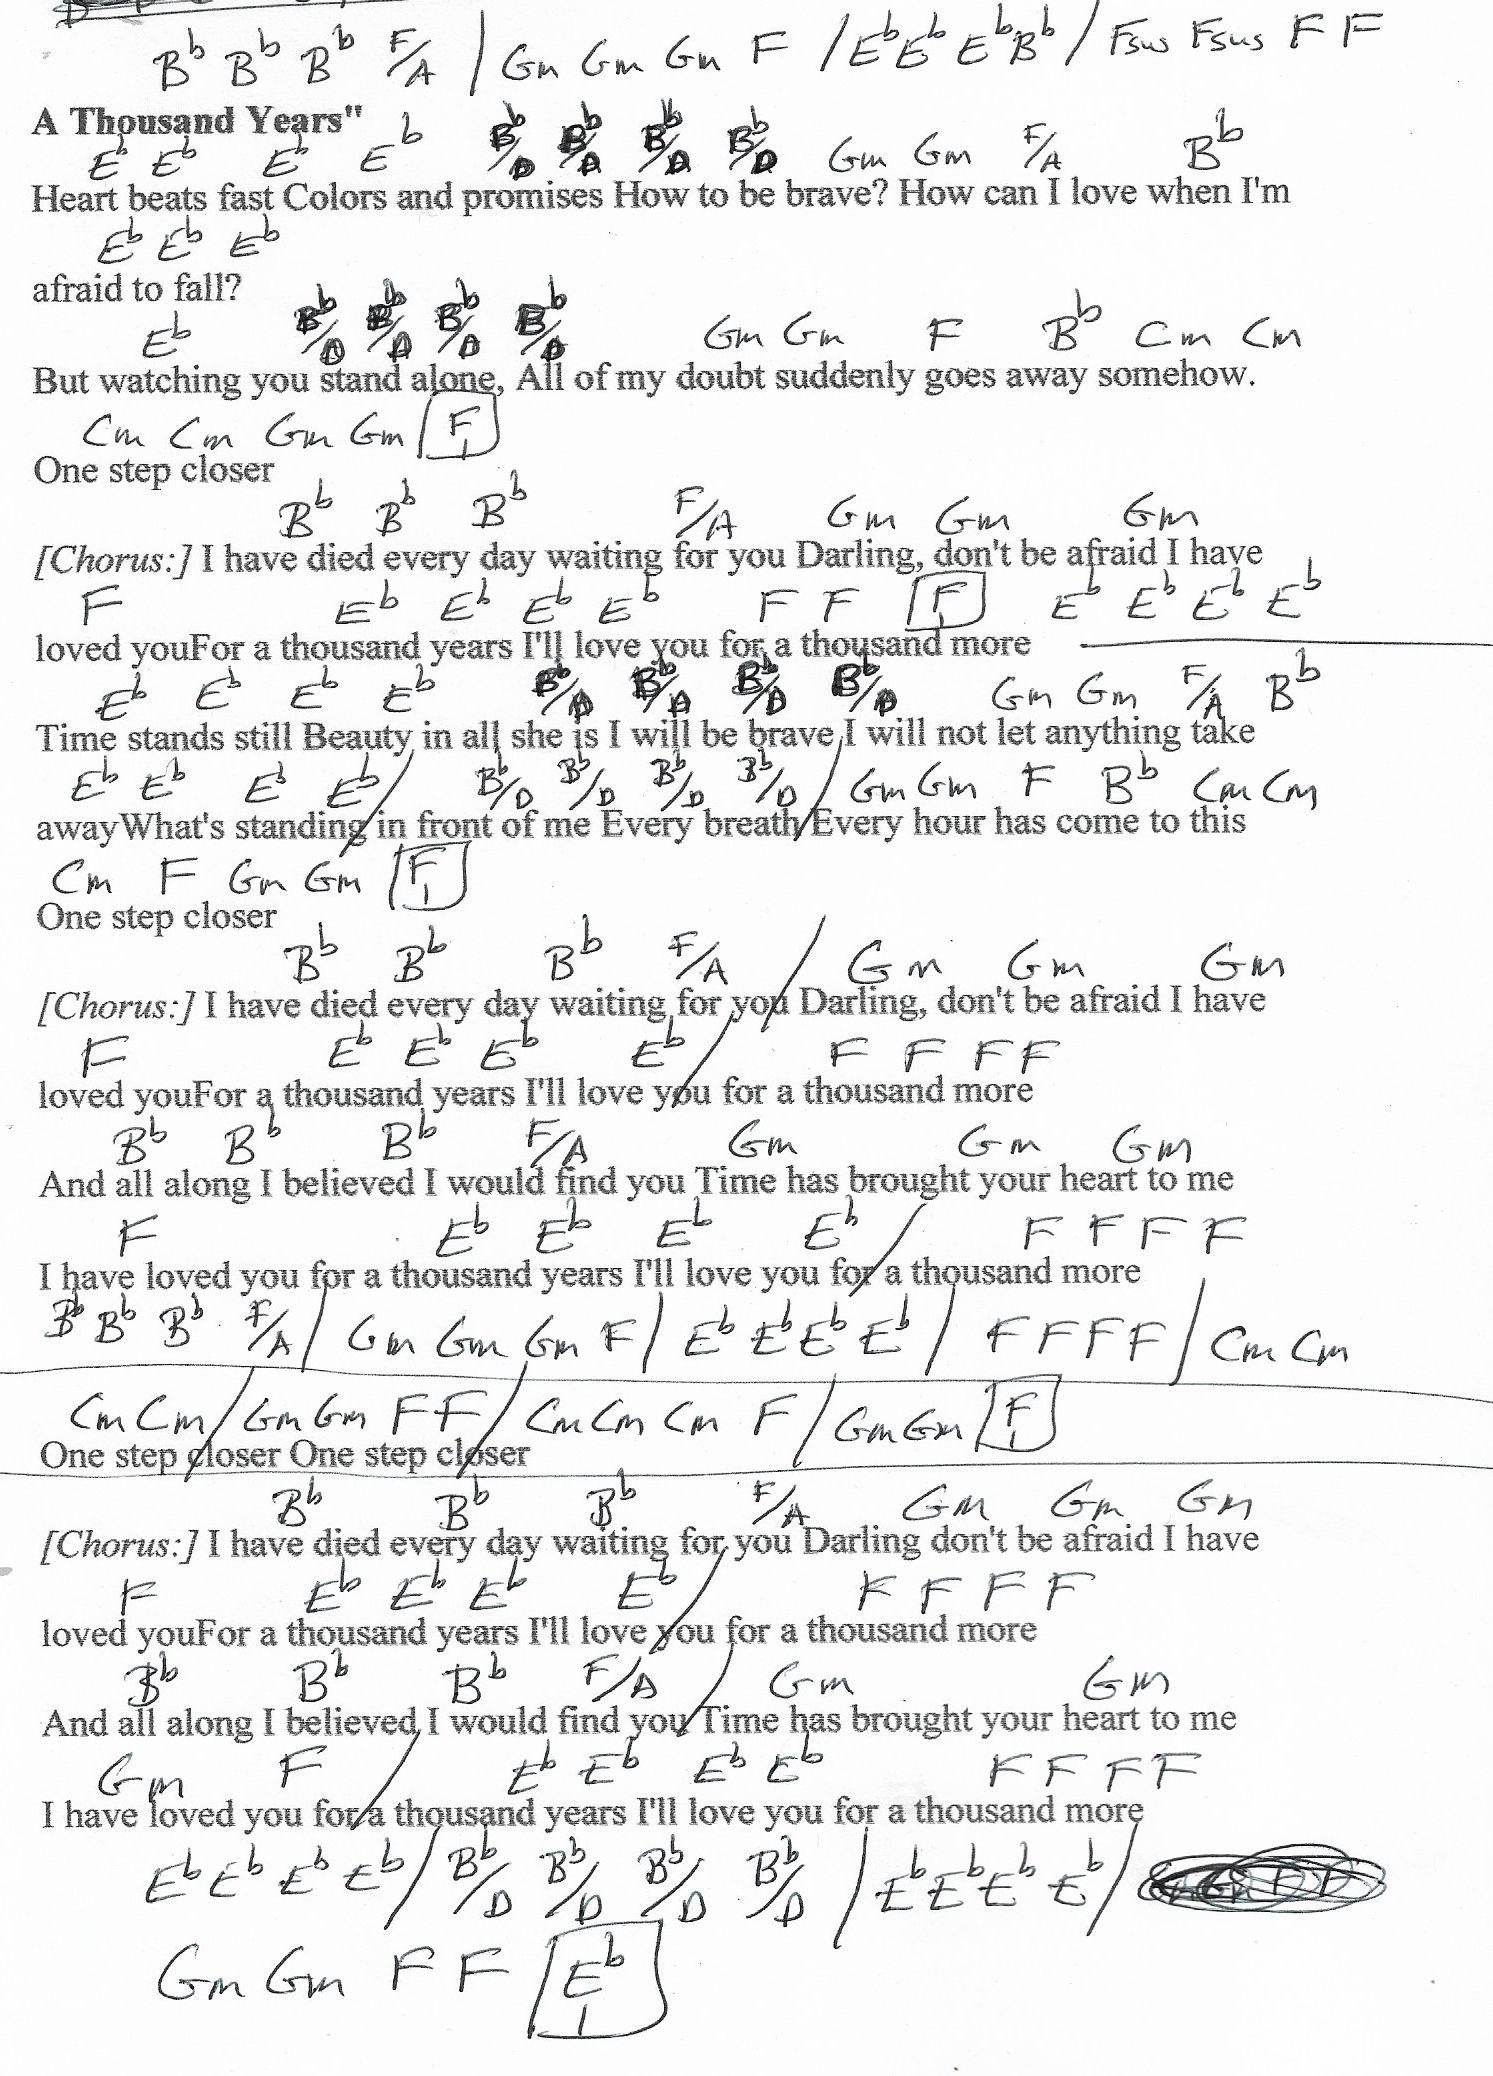 A Thousand Years Christina Perri Guitar Chord Chart in Bb Major ...